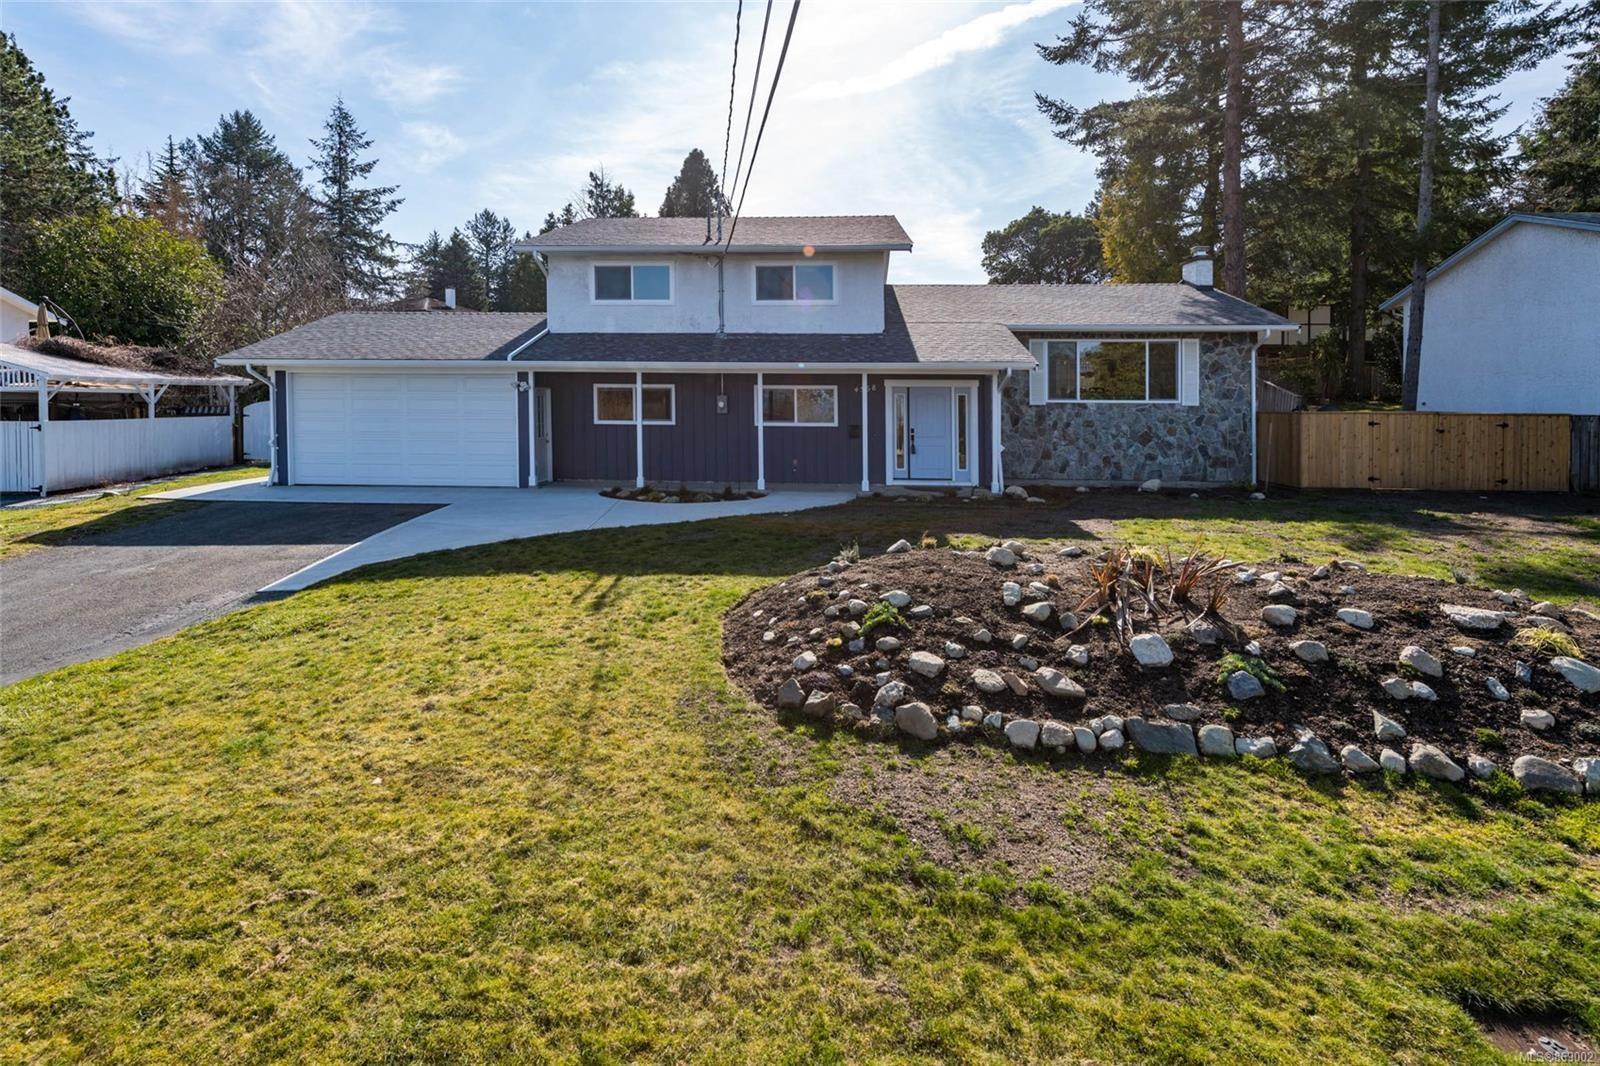 Main Photo: 4568 Montford Cres in : SE Gordon Head House for sale (Saanich East)  : MLS®# 869002